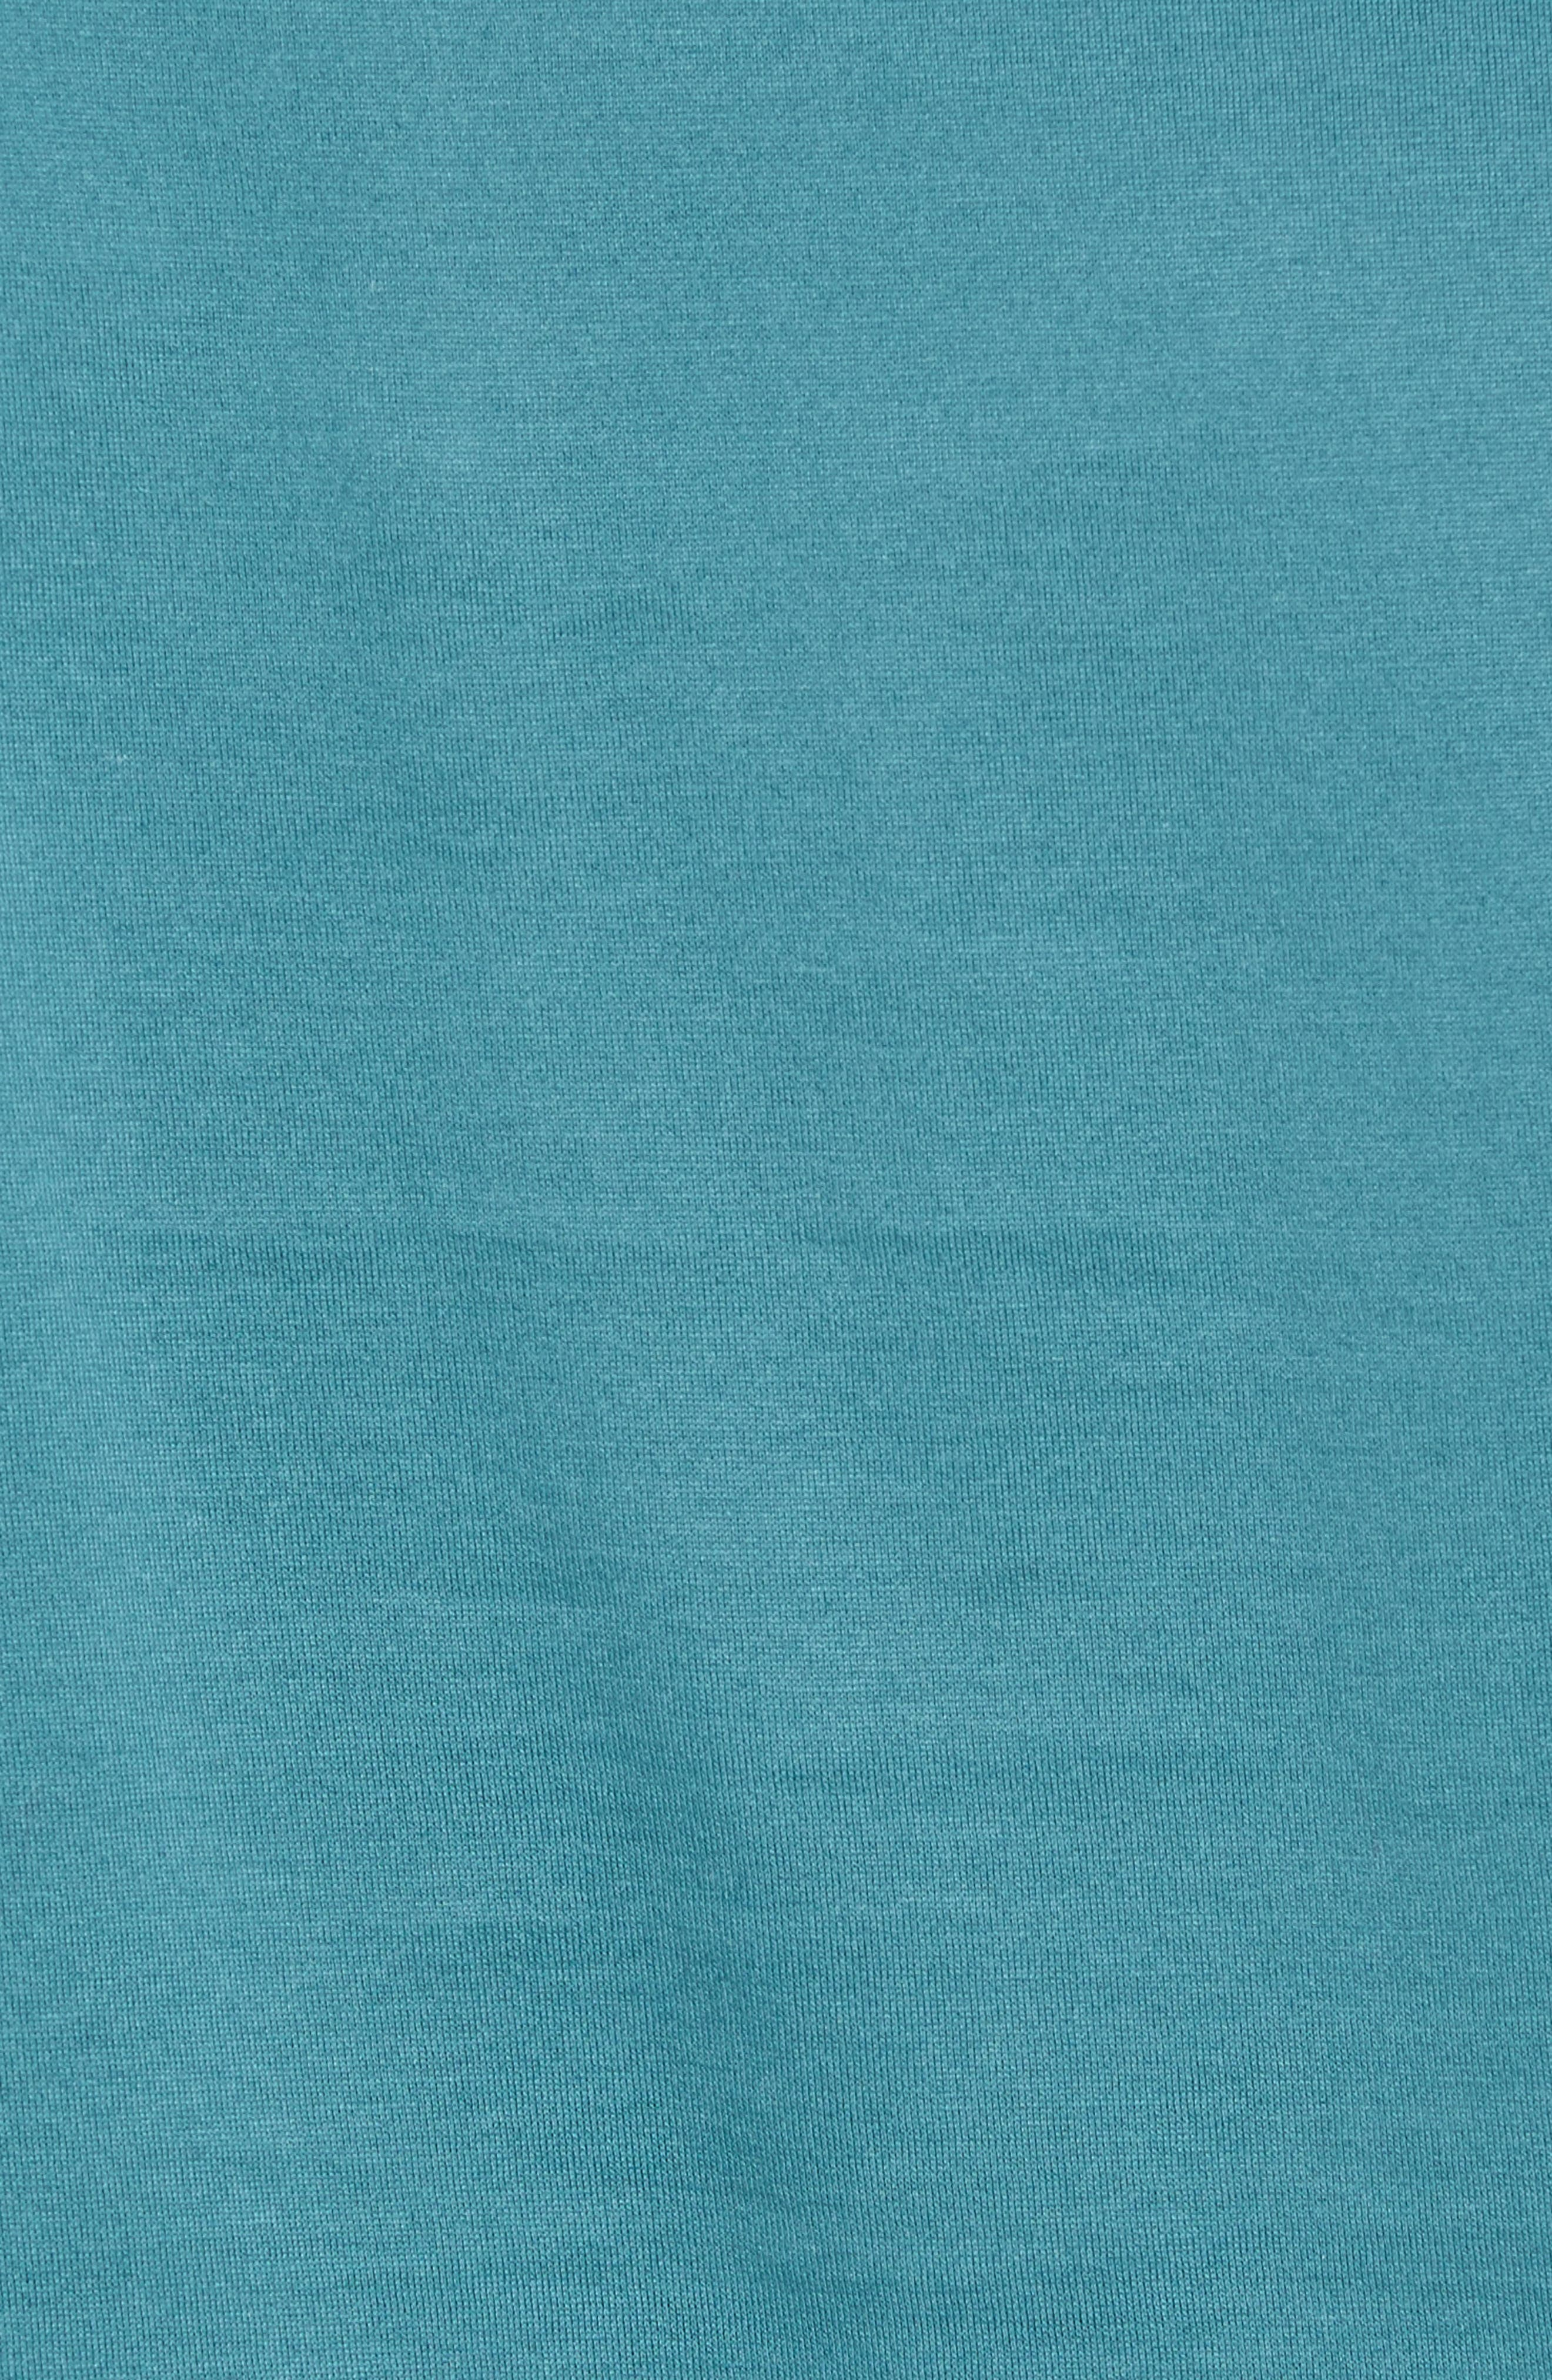 Trim Fit Fashion Polo,                             Alternate thumbnail 5, color,                             Teal Hydro